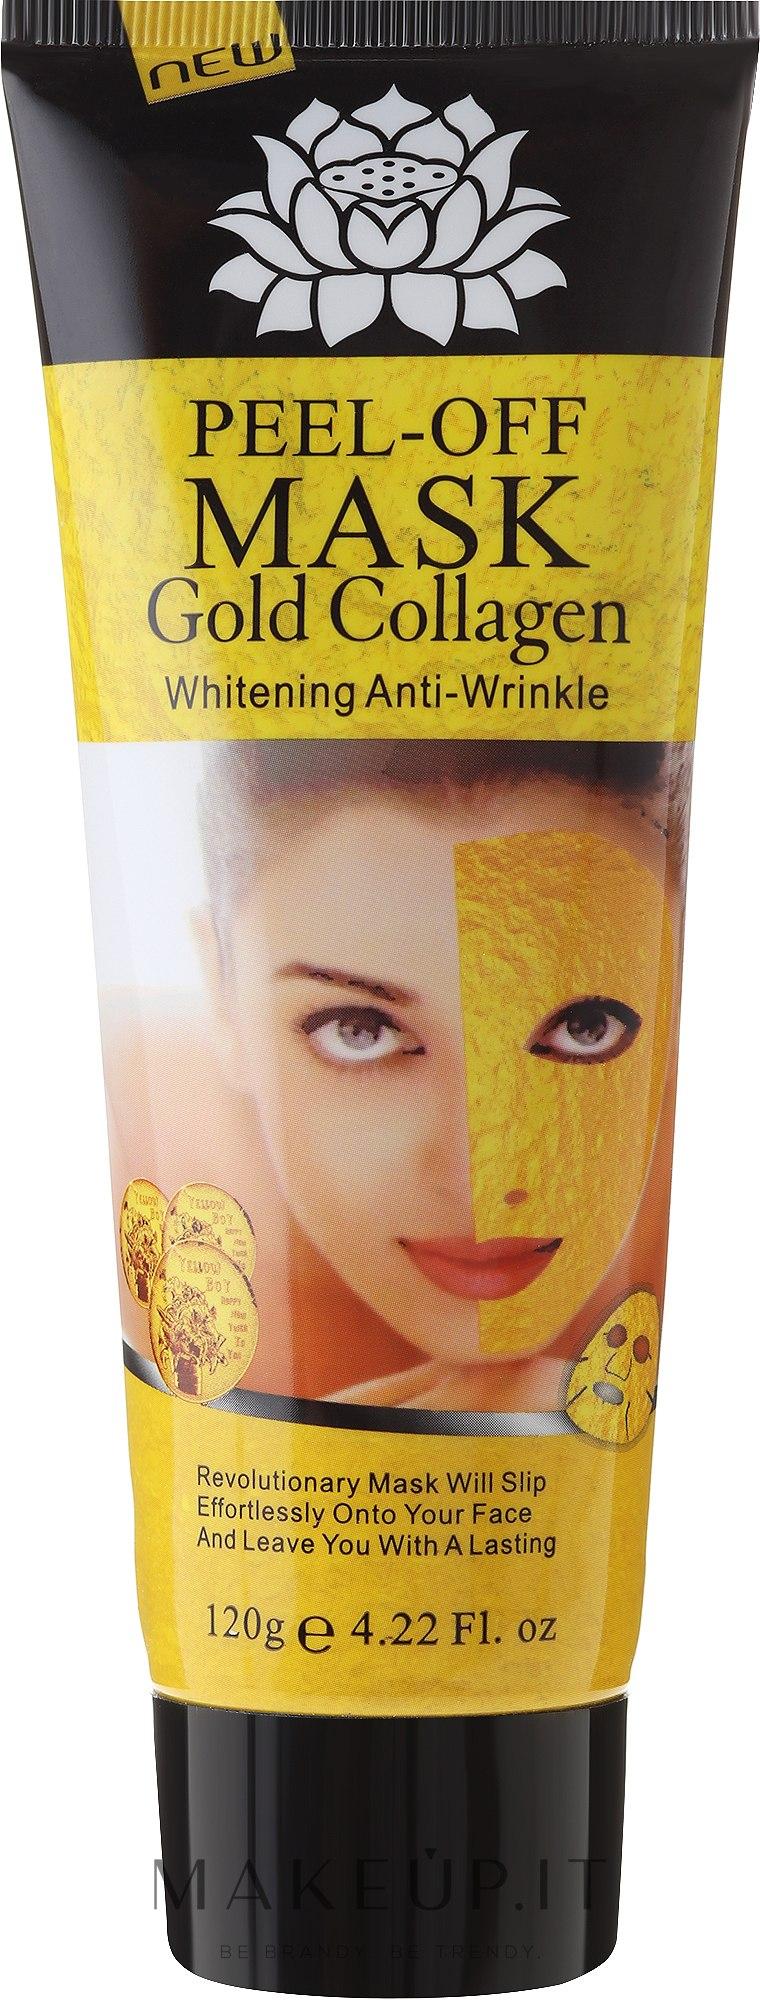 Maschera viso anti-età con oro - Pilaten Anti Aging 24K Gold Collagen Peel Off Face Mask — foto 120 g